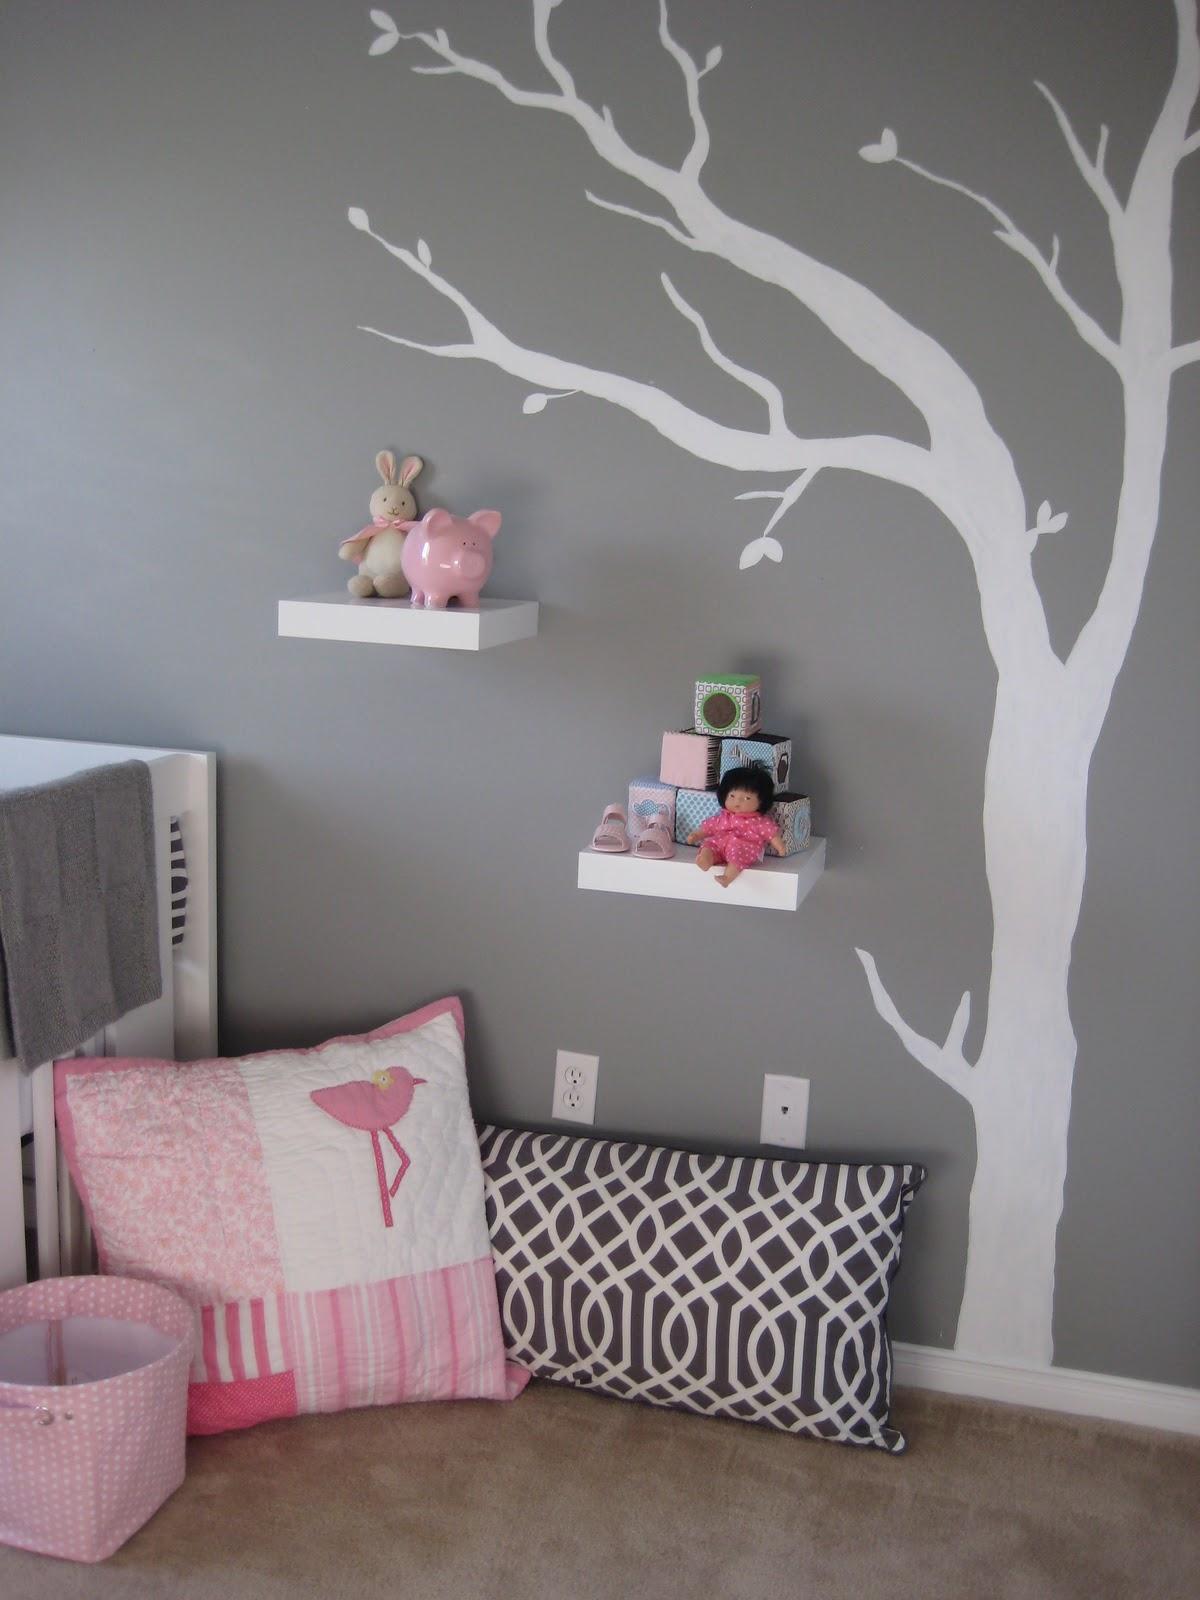 world of arts for children mod gray and pink nursery. Black Bedroom Furniture Sets. Home Design Ideas